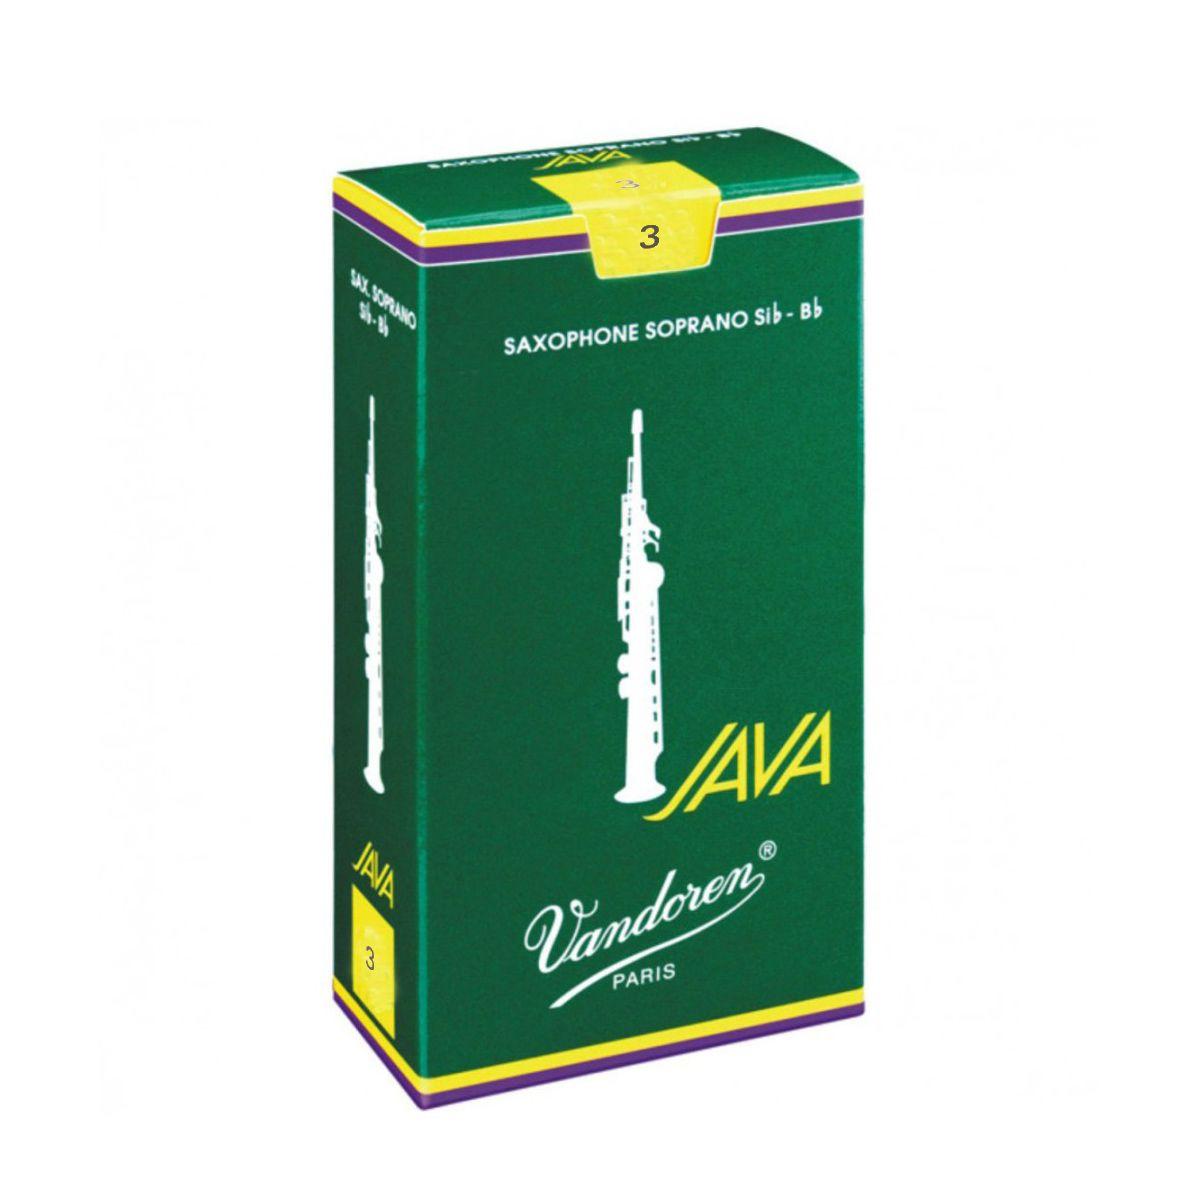 Palheta Vandoren Java Nº 3 para Sax Soprano